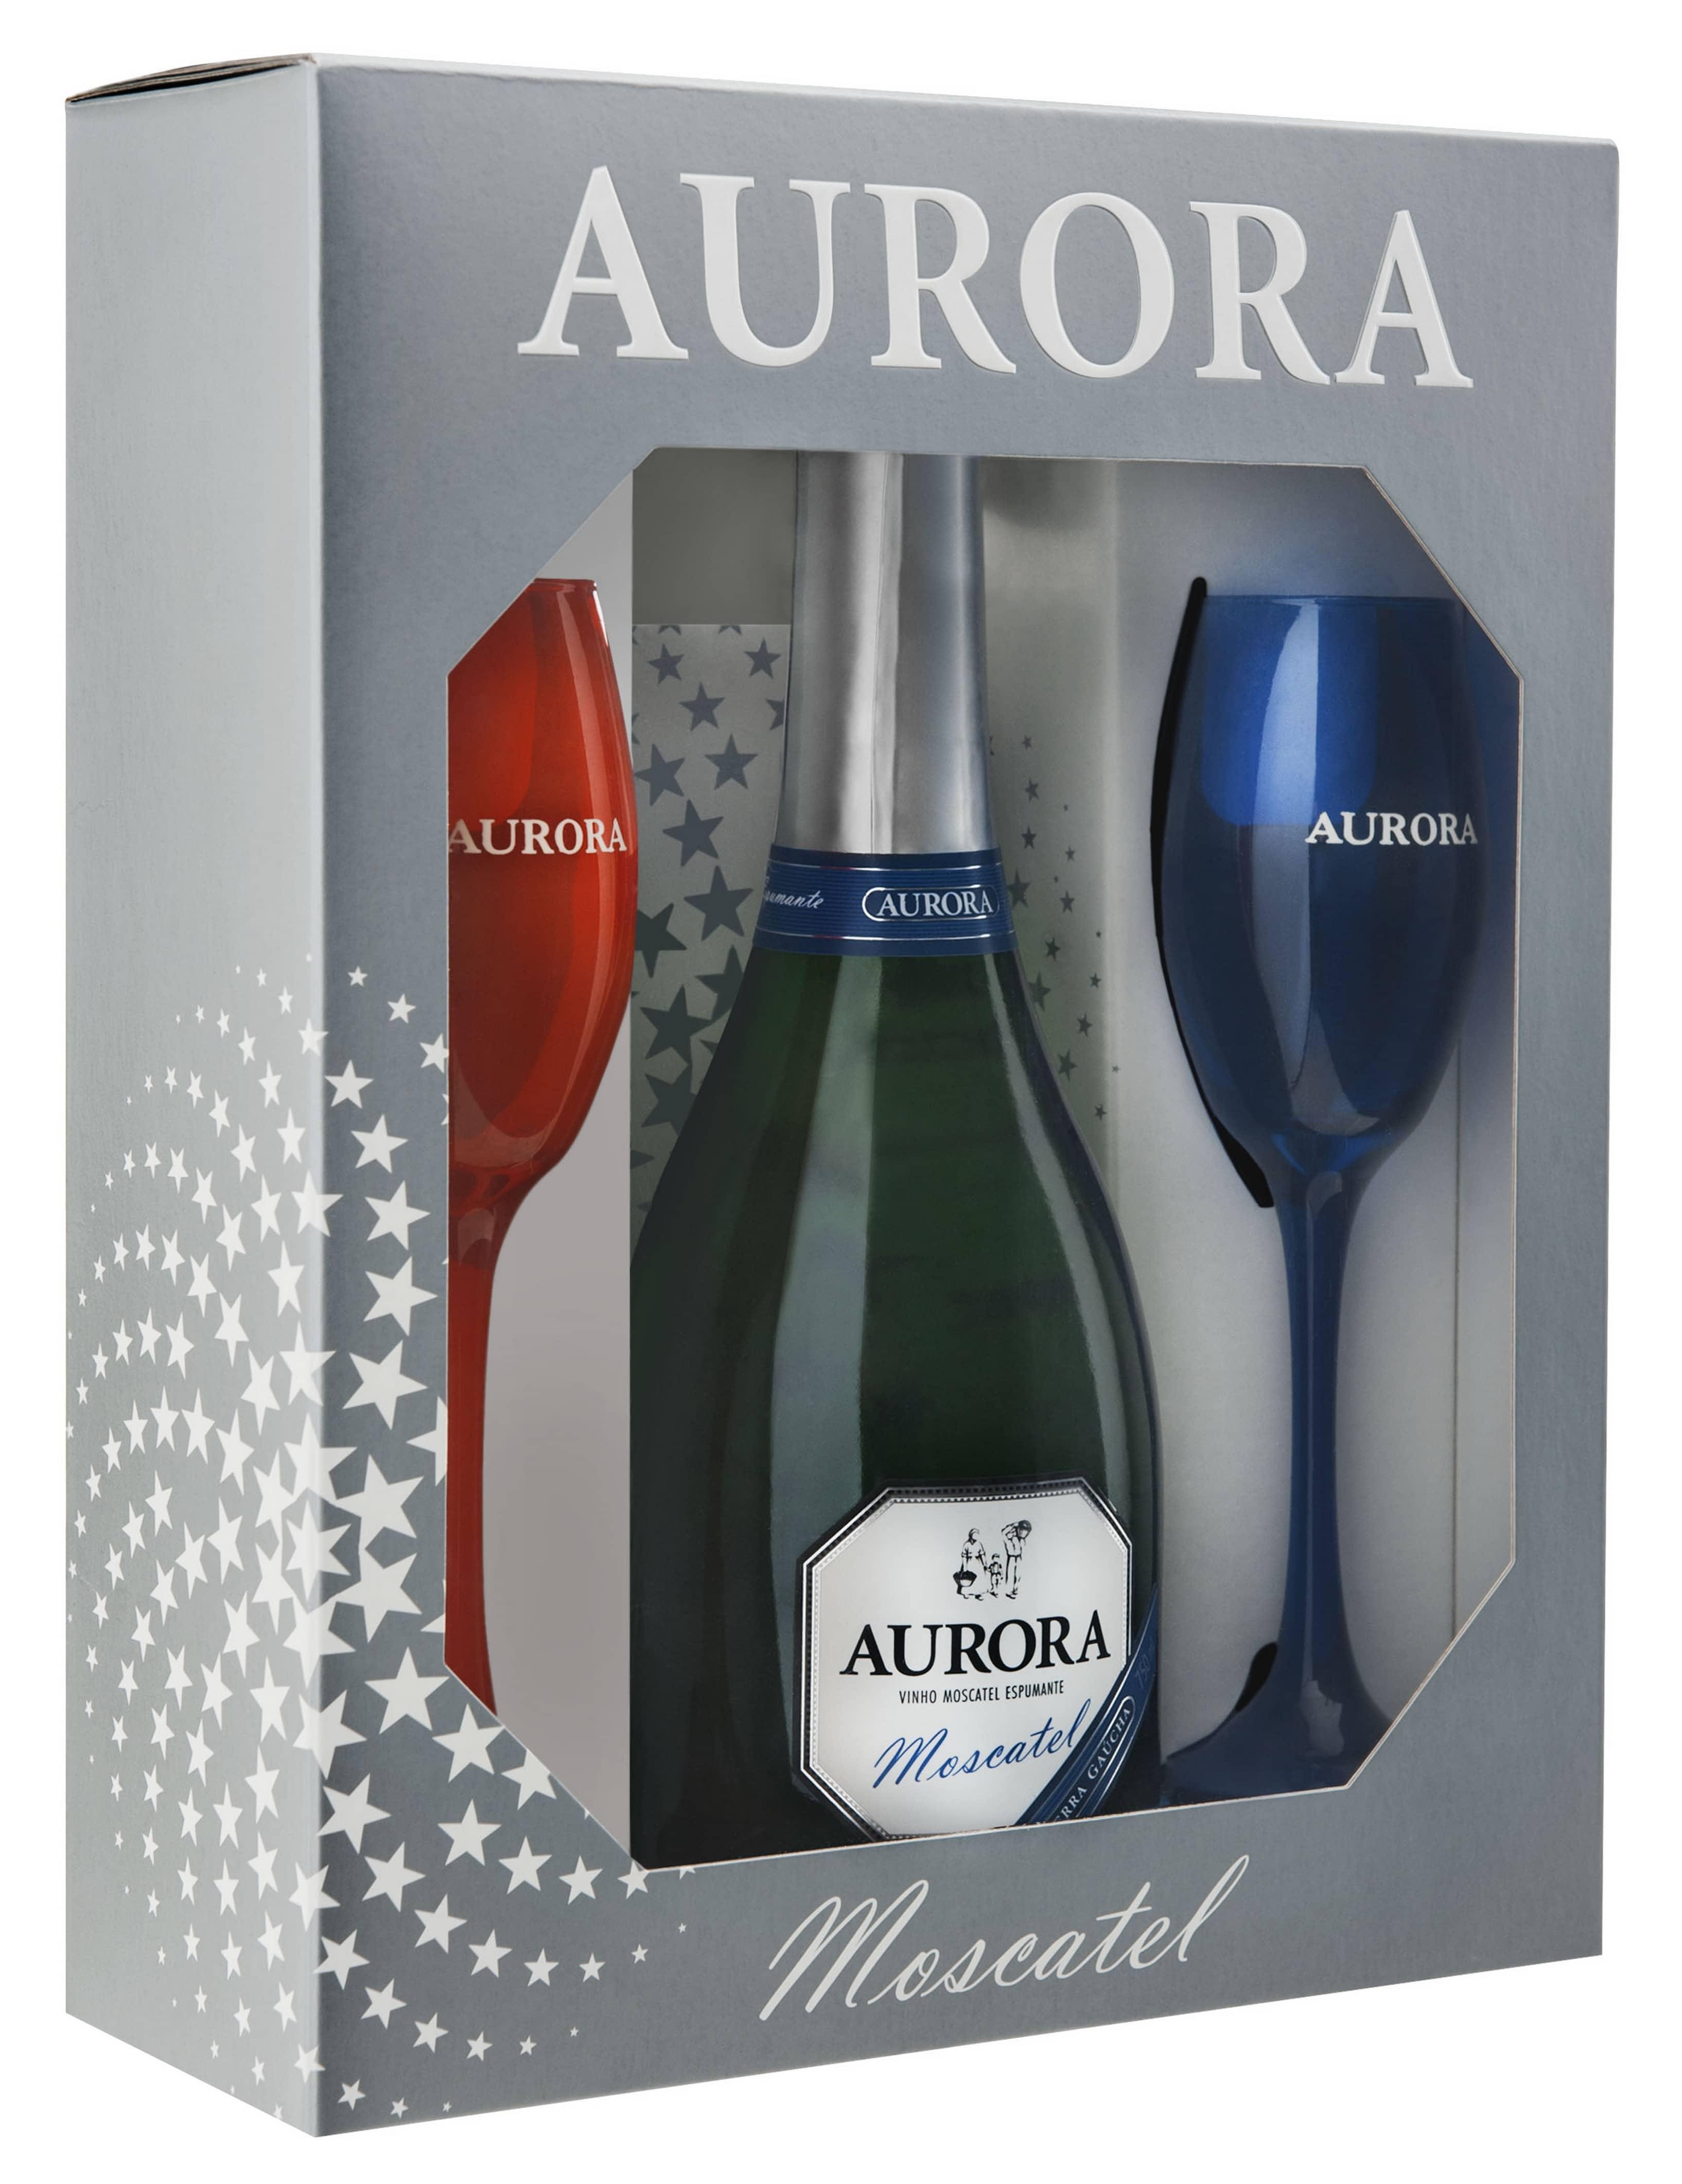 Maleta-Aurora-Moscatel